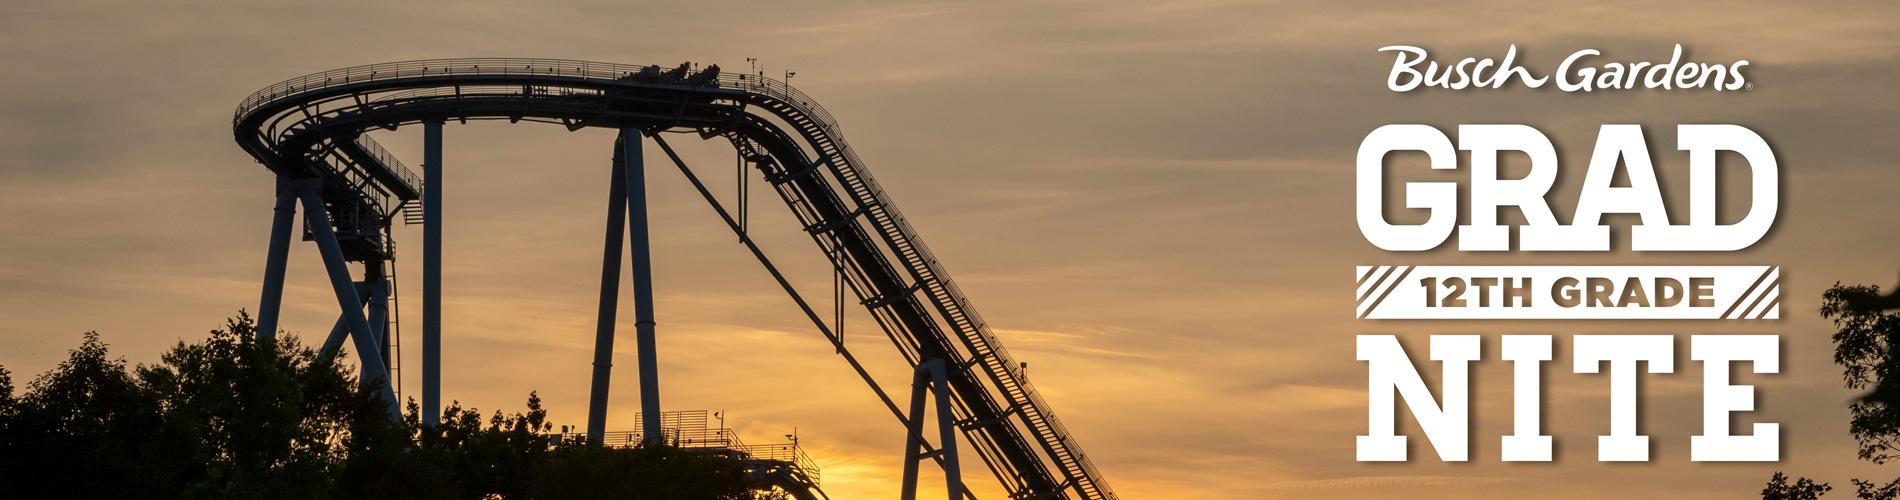 Griffon during sunset with the Busch Gardens Grad Nite Logo